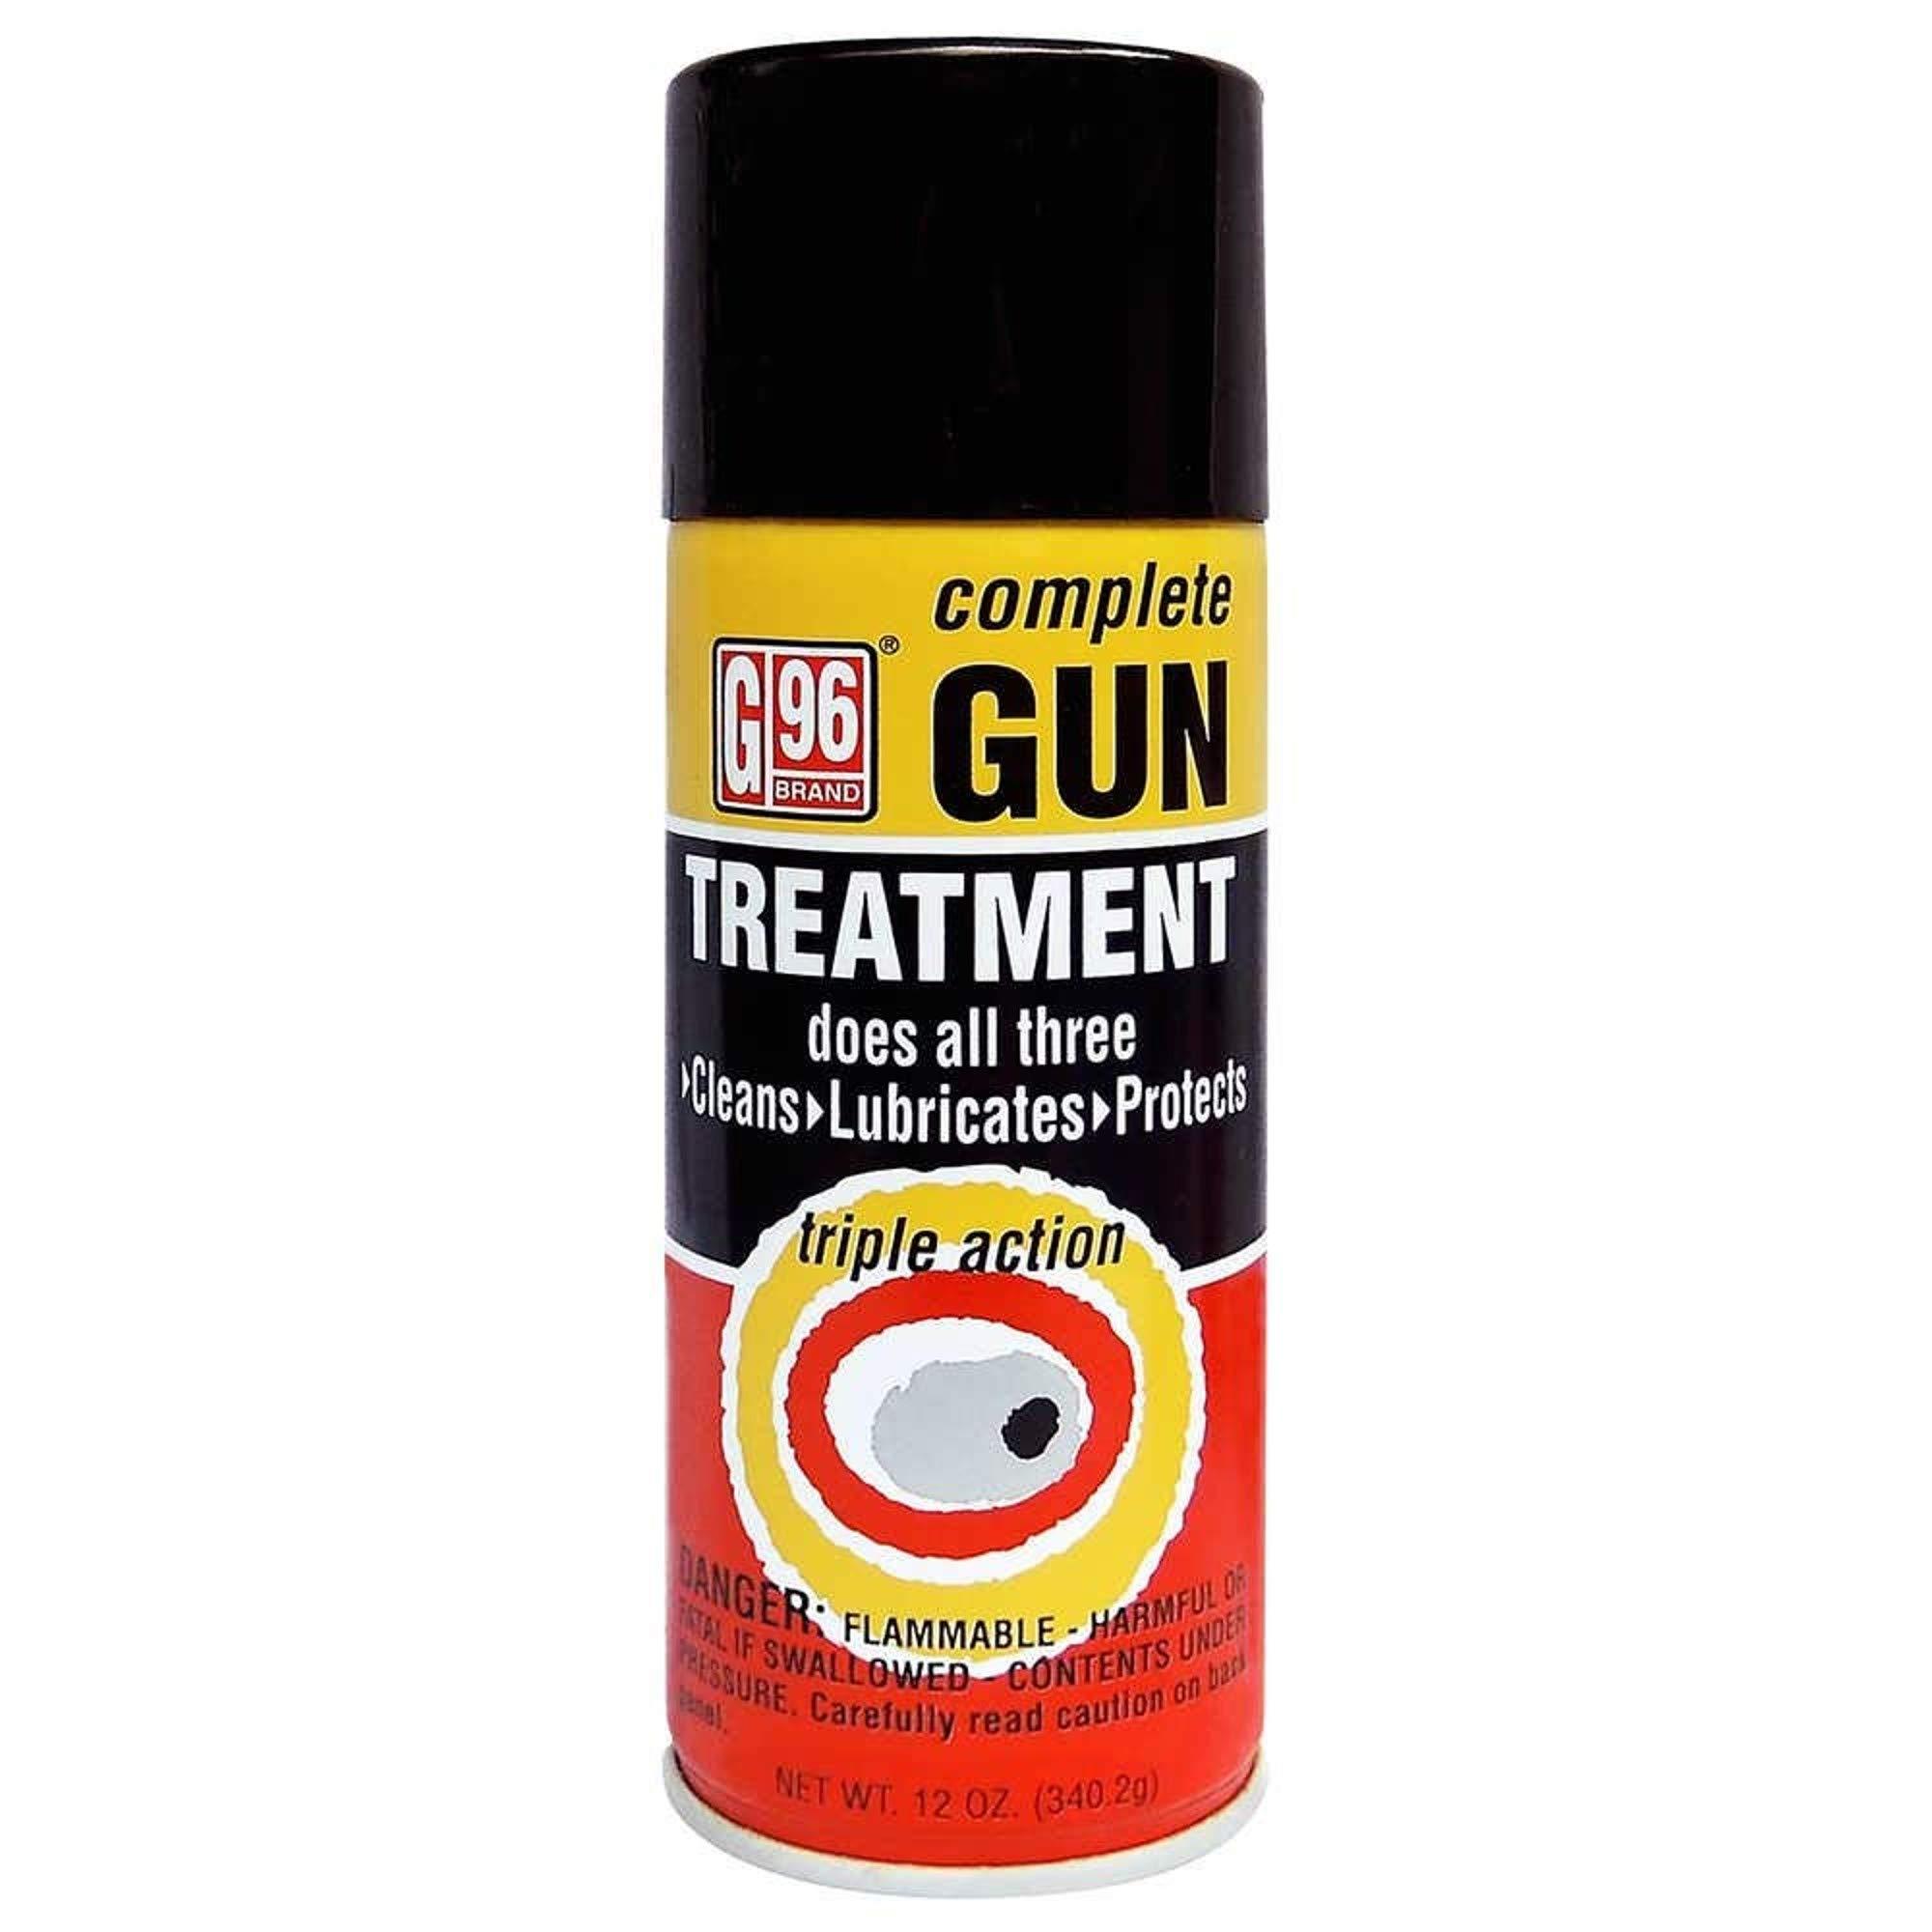 G96 Complete Triple-Action Gun Treatment 12 oz by G&G